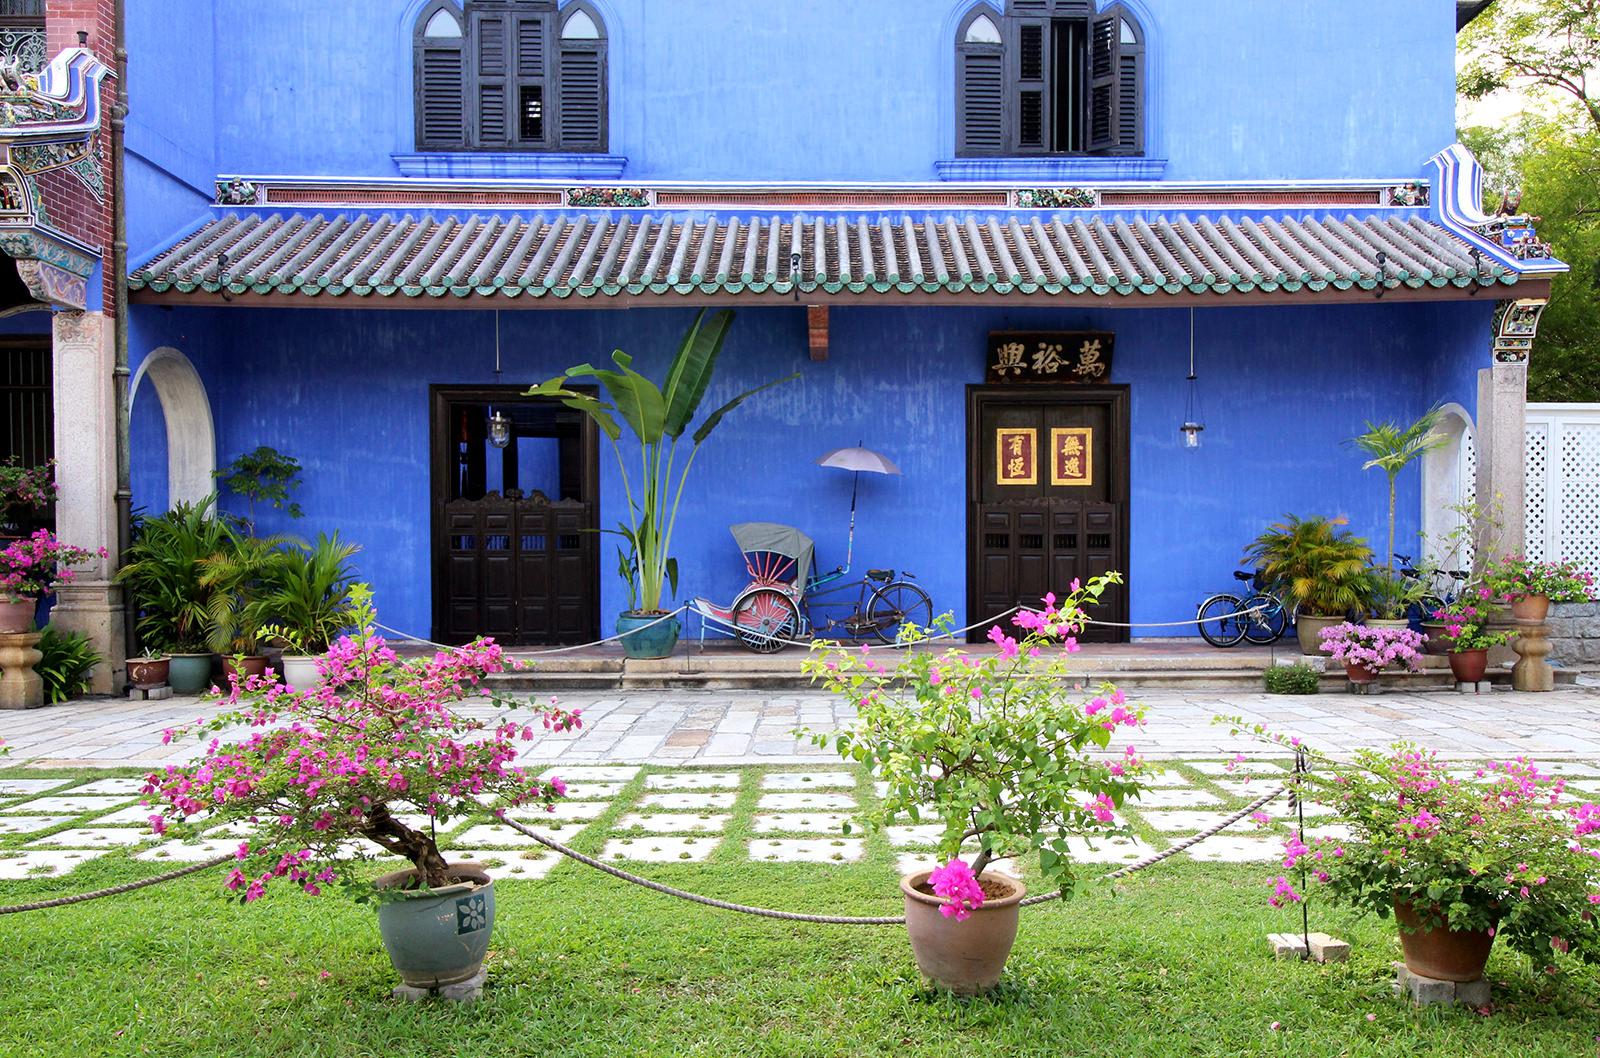 boutique-hotel-penang-island-blue-mansion-architecture-07 Architecture